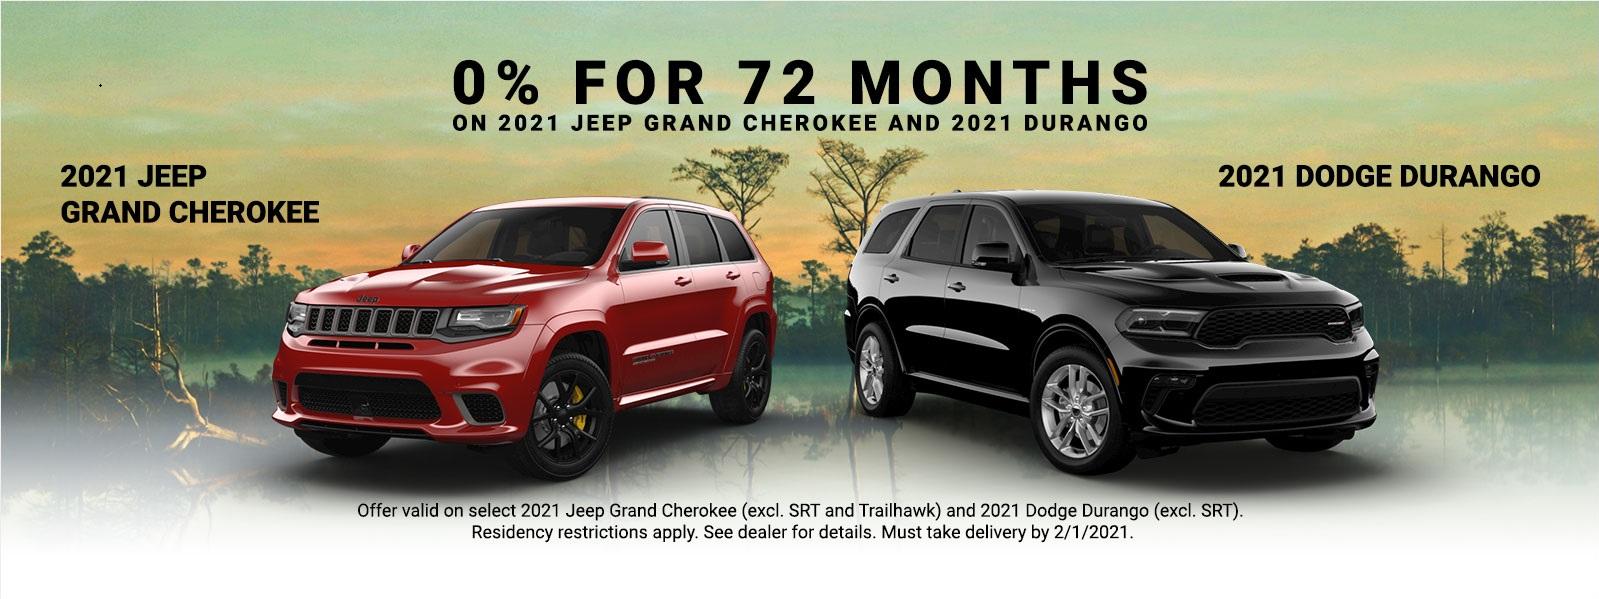 2021 Grand Cherokee and Durango Specials